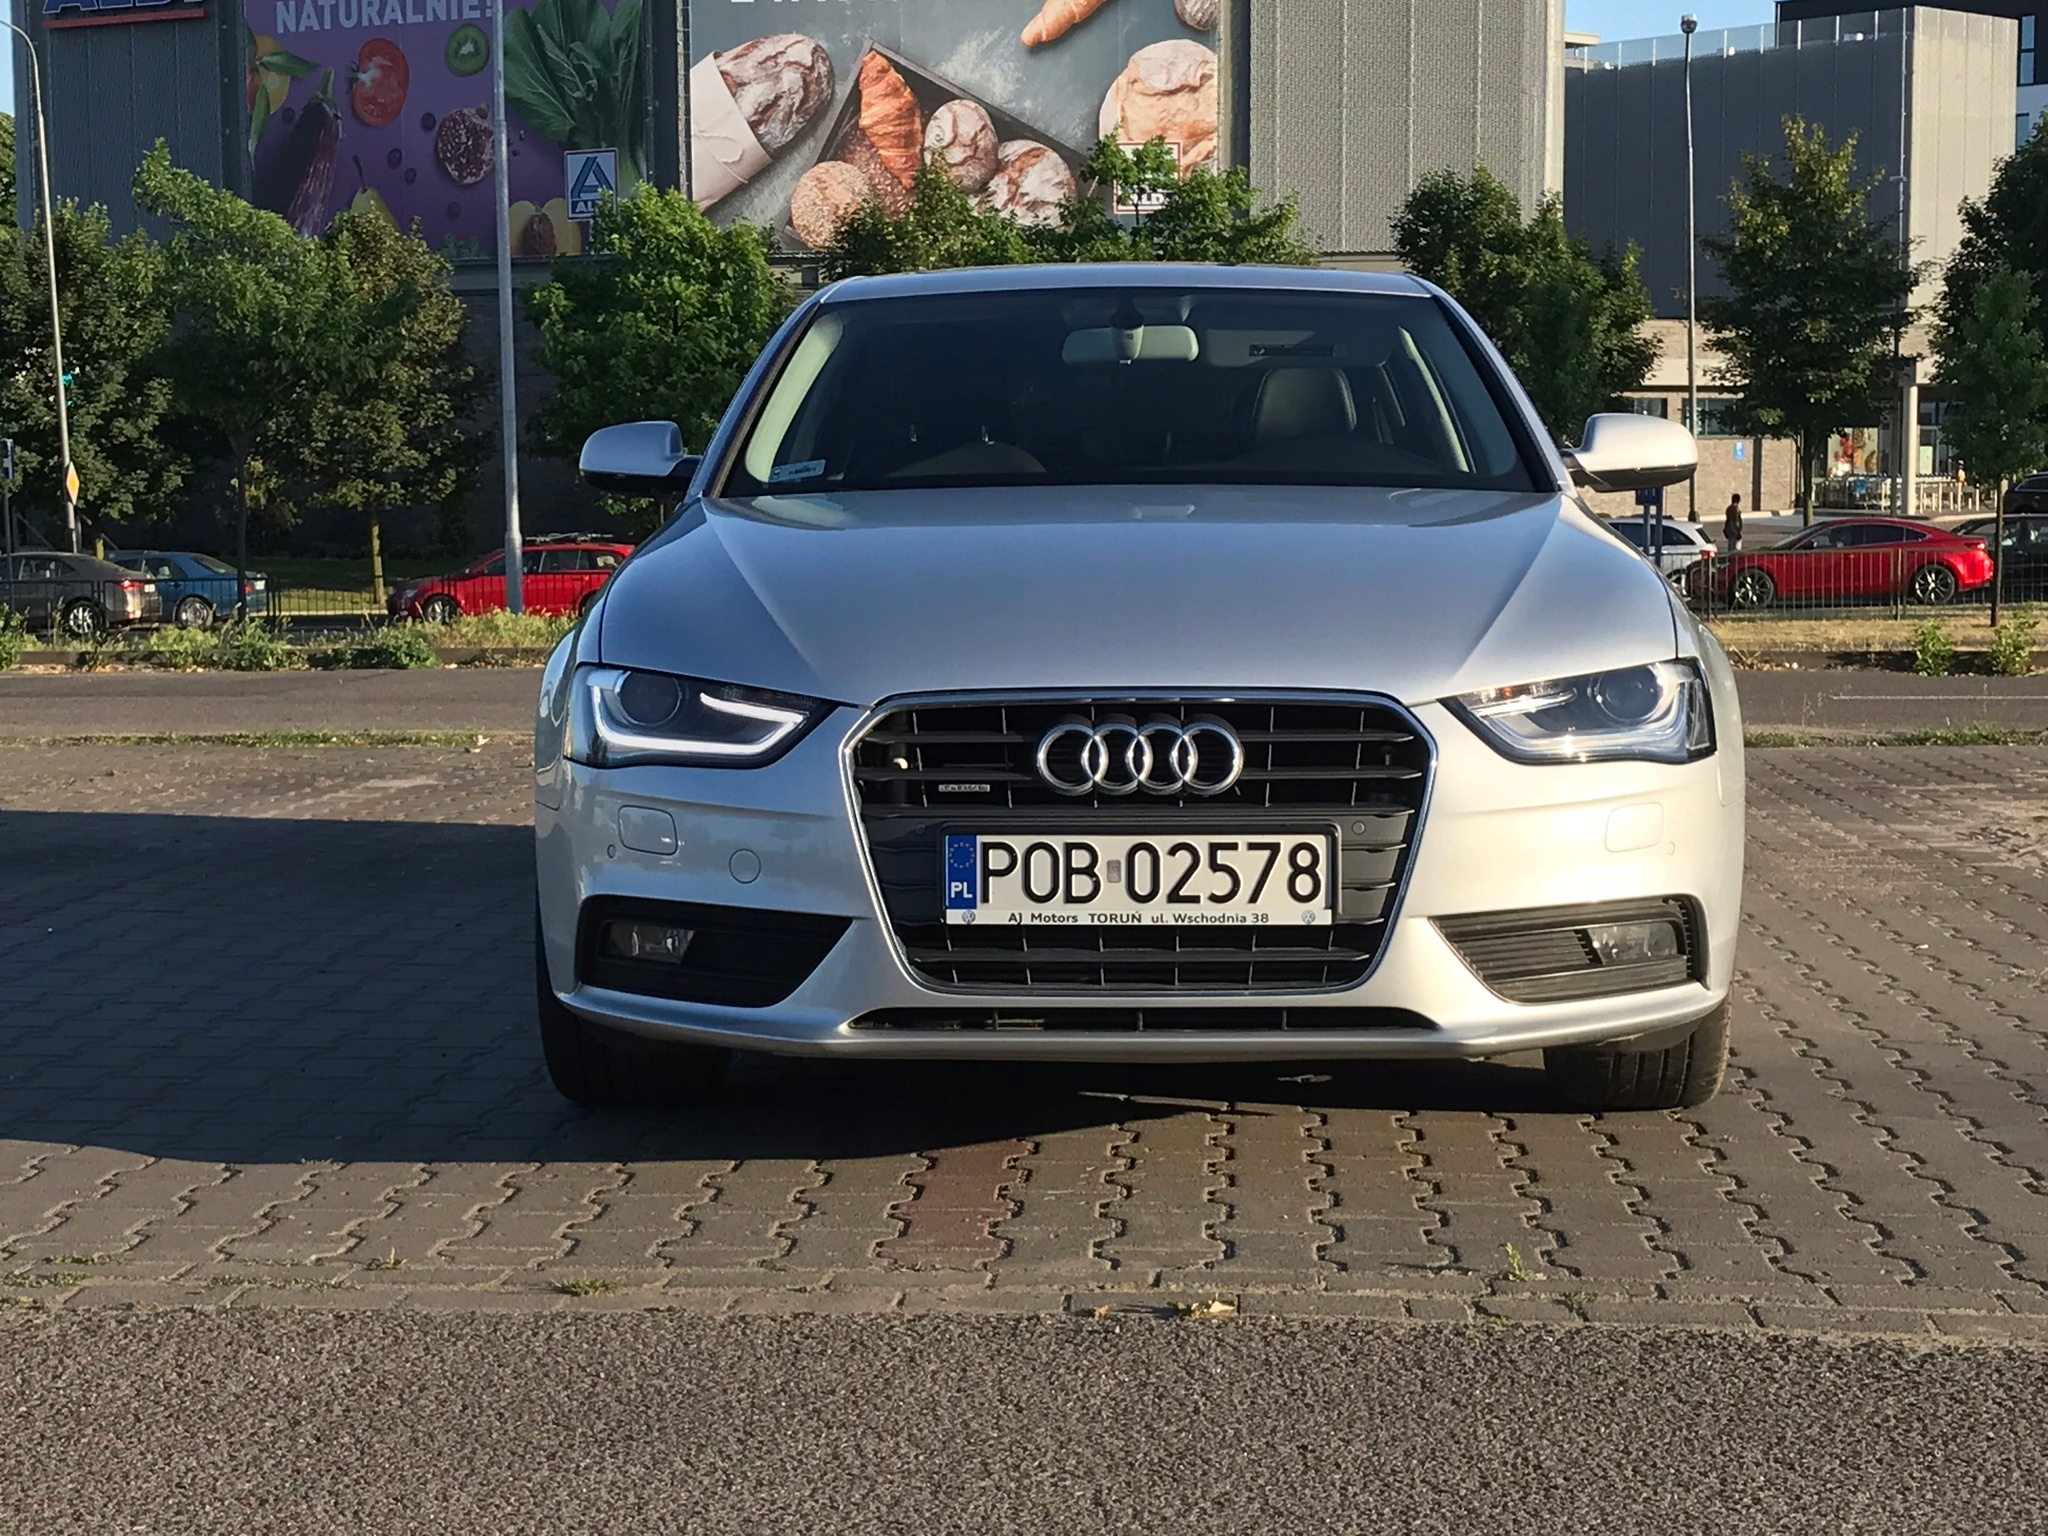 Audi A4 B8 20 Tfsi Quattro 7410842097 Oficjalne Archiwum Allegro